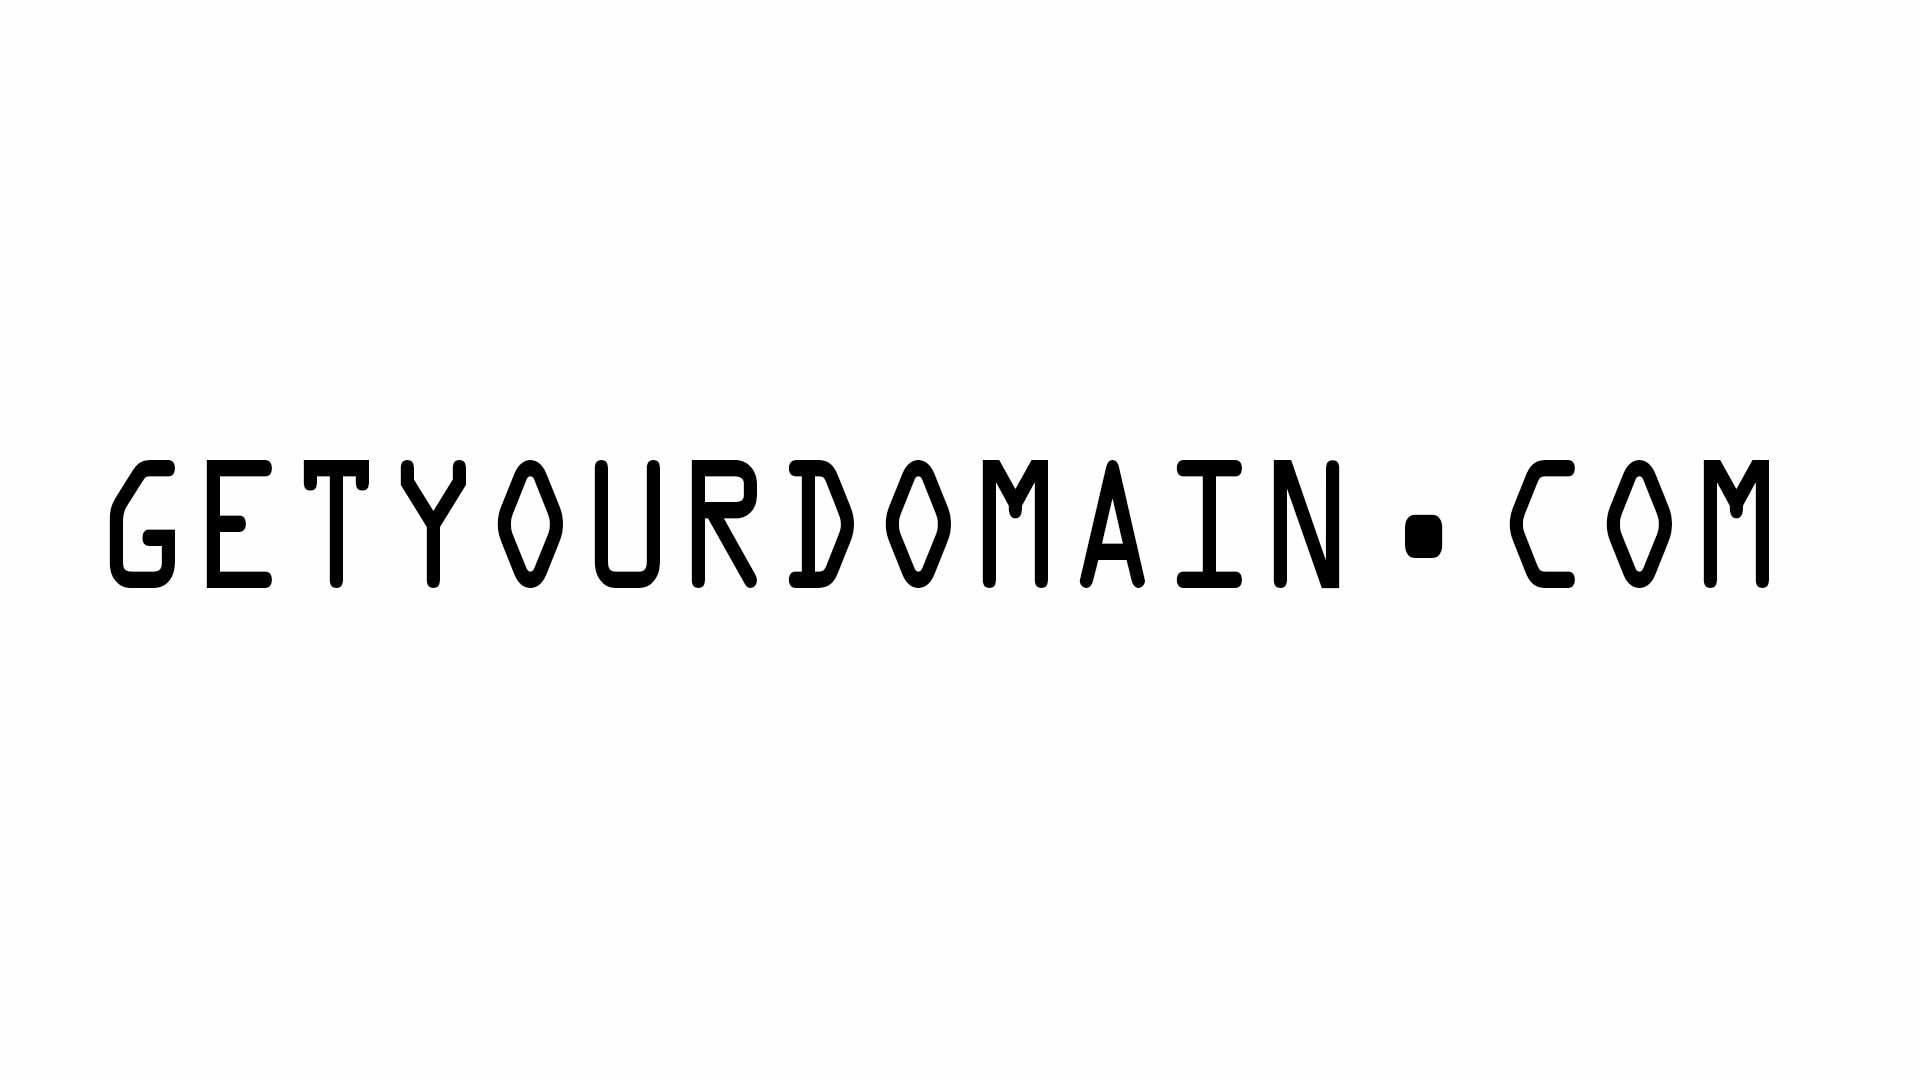 Claim your domain